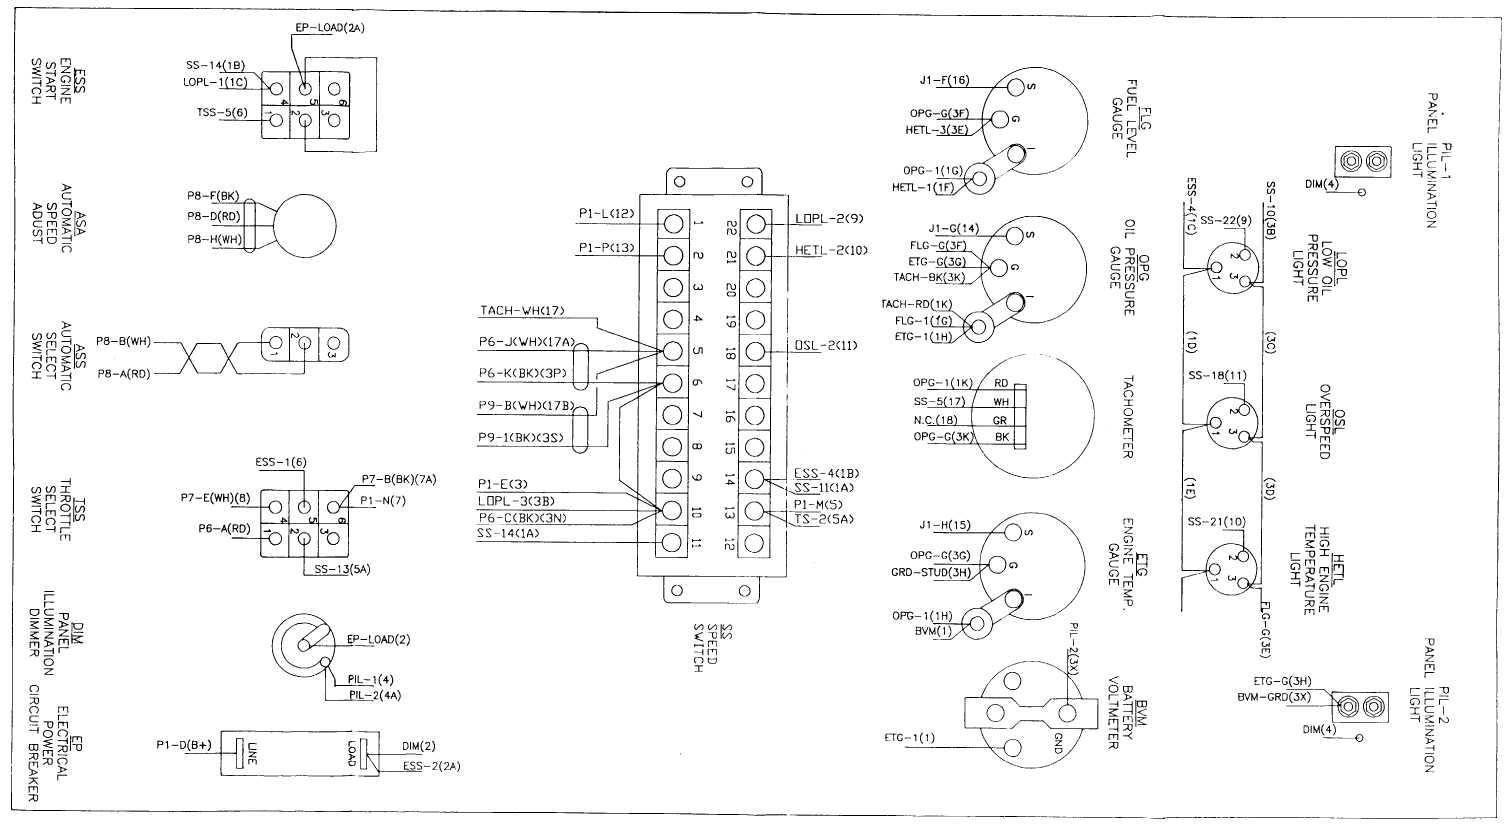 control wiring diagram symbols 07 ford ranger radio panel schematic free